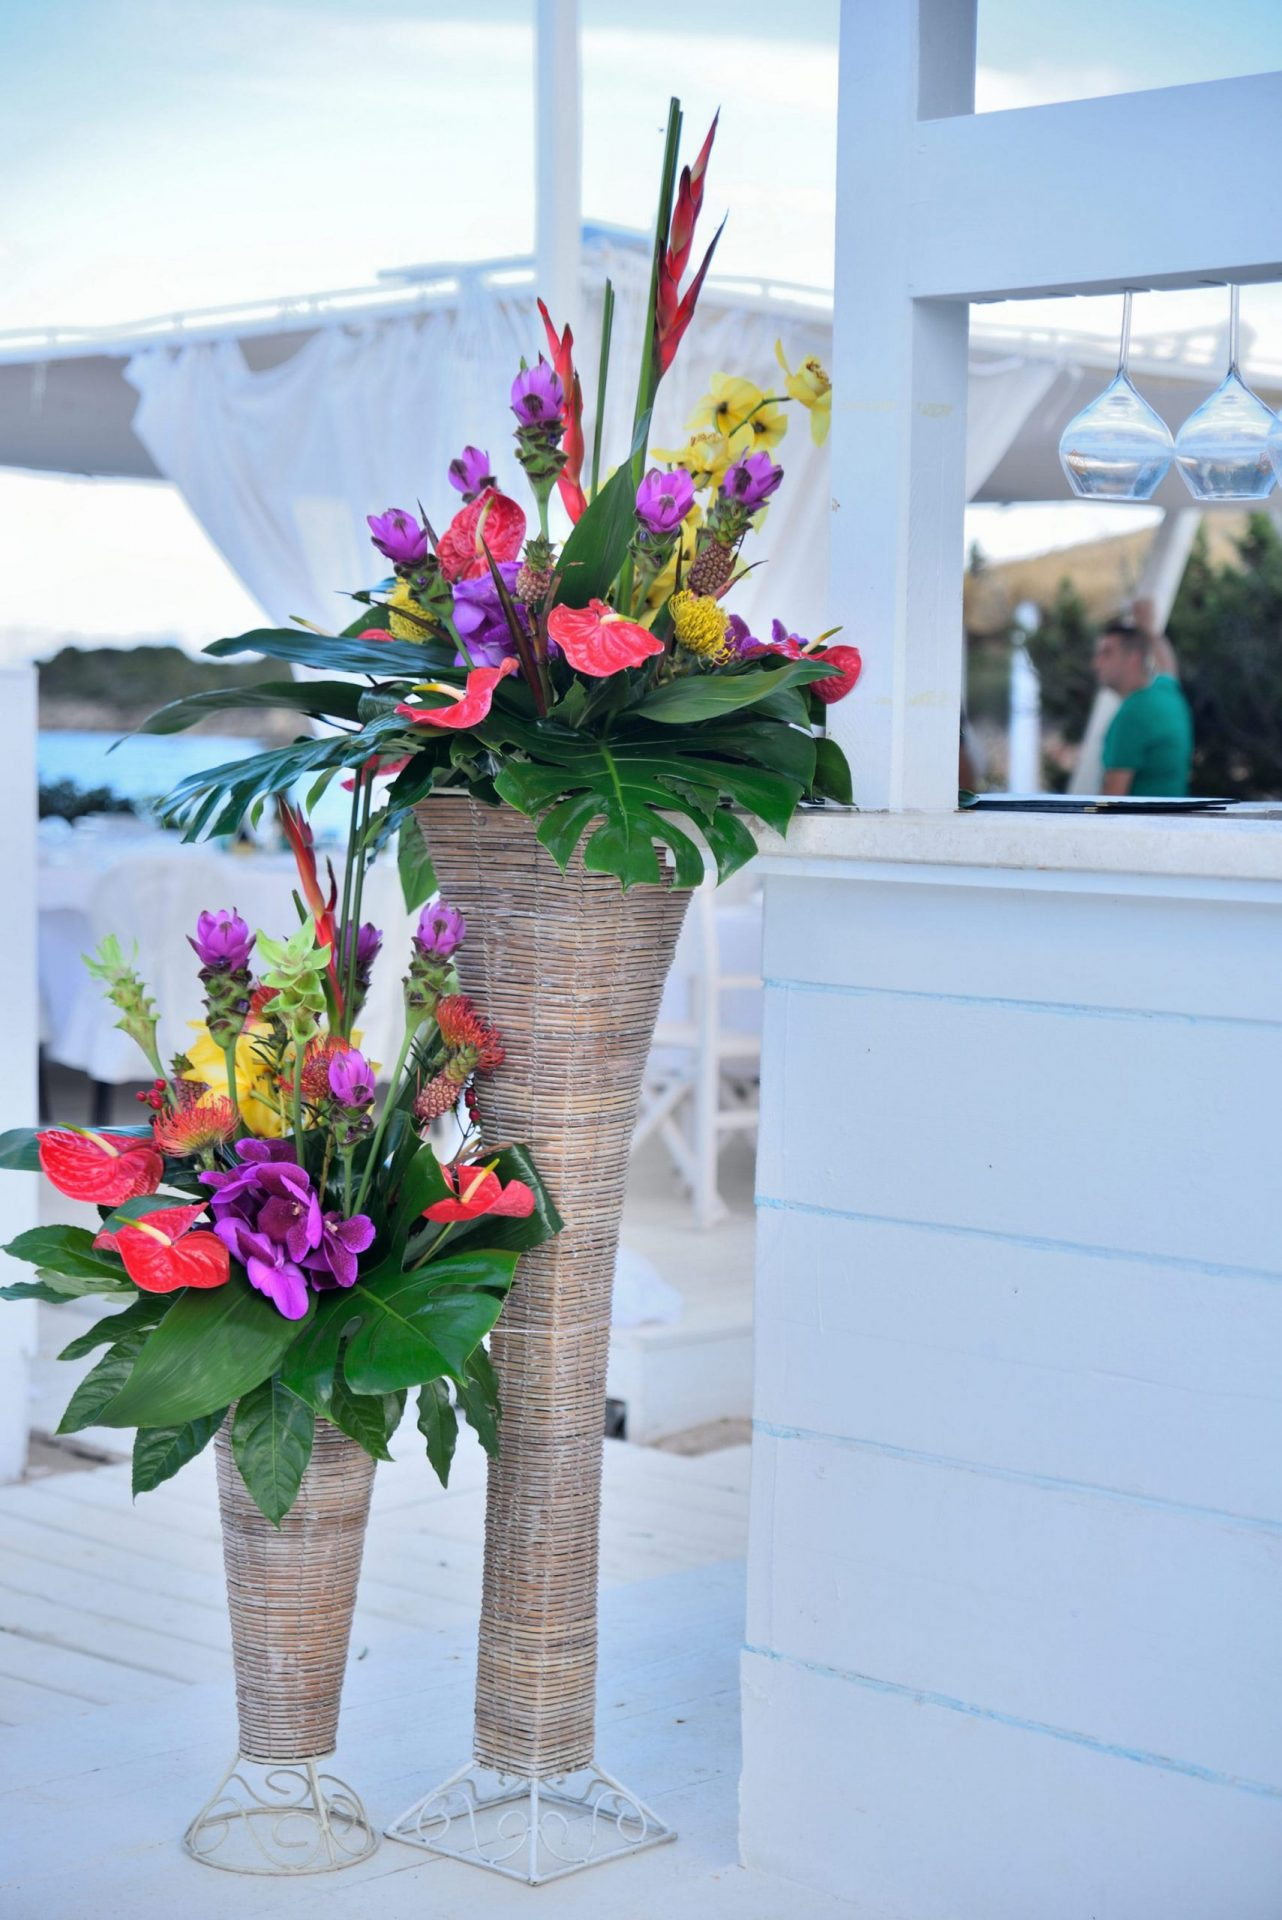 Tropical party in Porto Cervo, flower arrangements